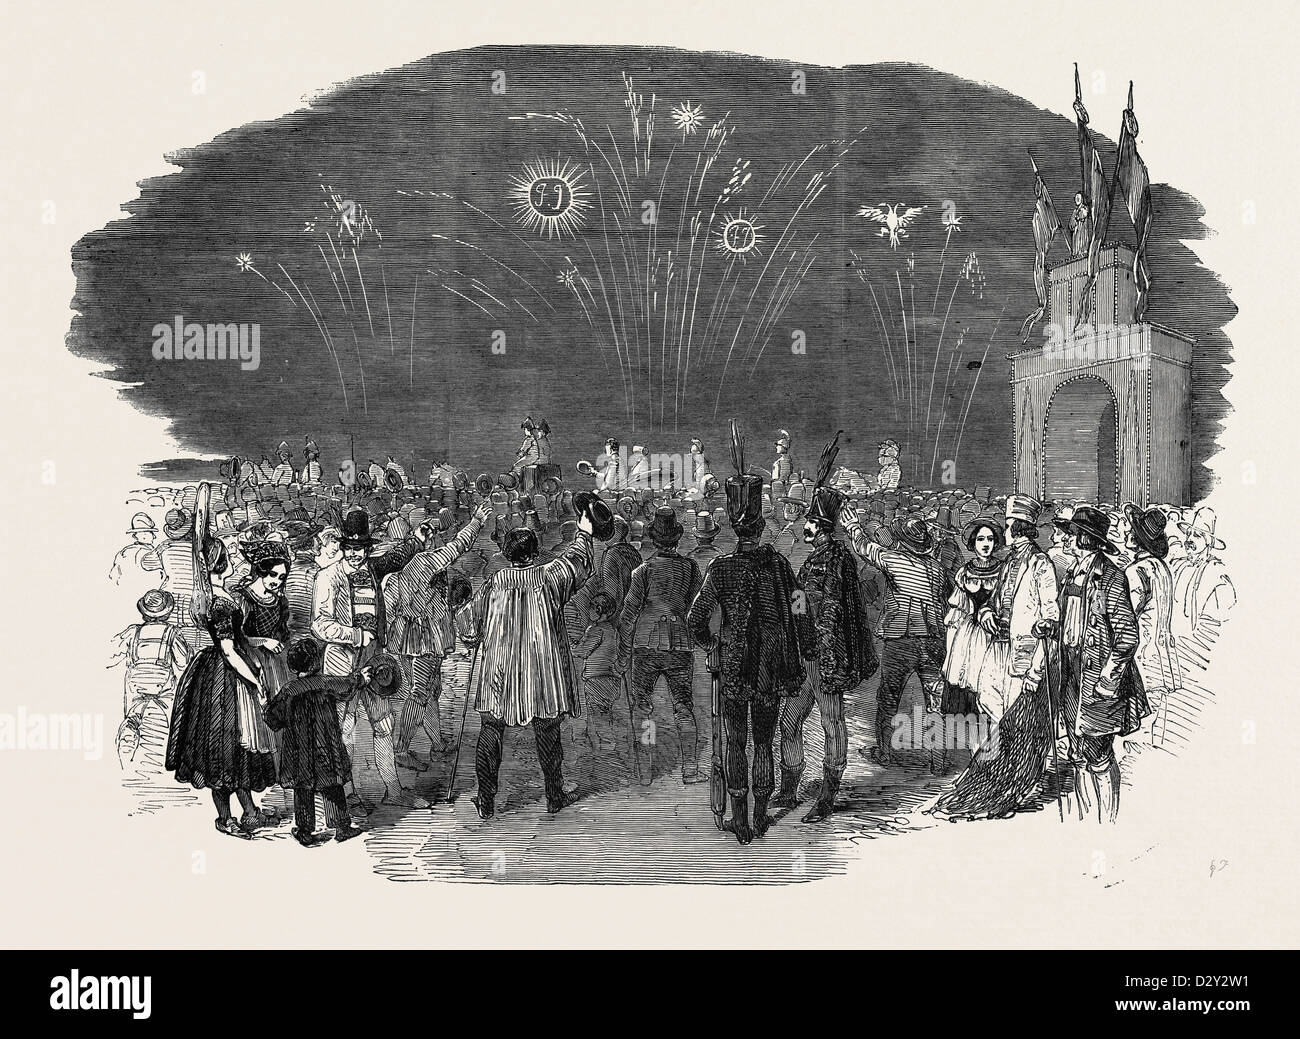 RETURN OF THE EMPEROR OF AUSTRIA TO VIENNA, 1852 - Stock Image